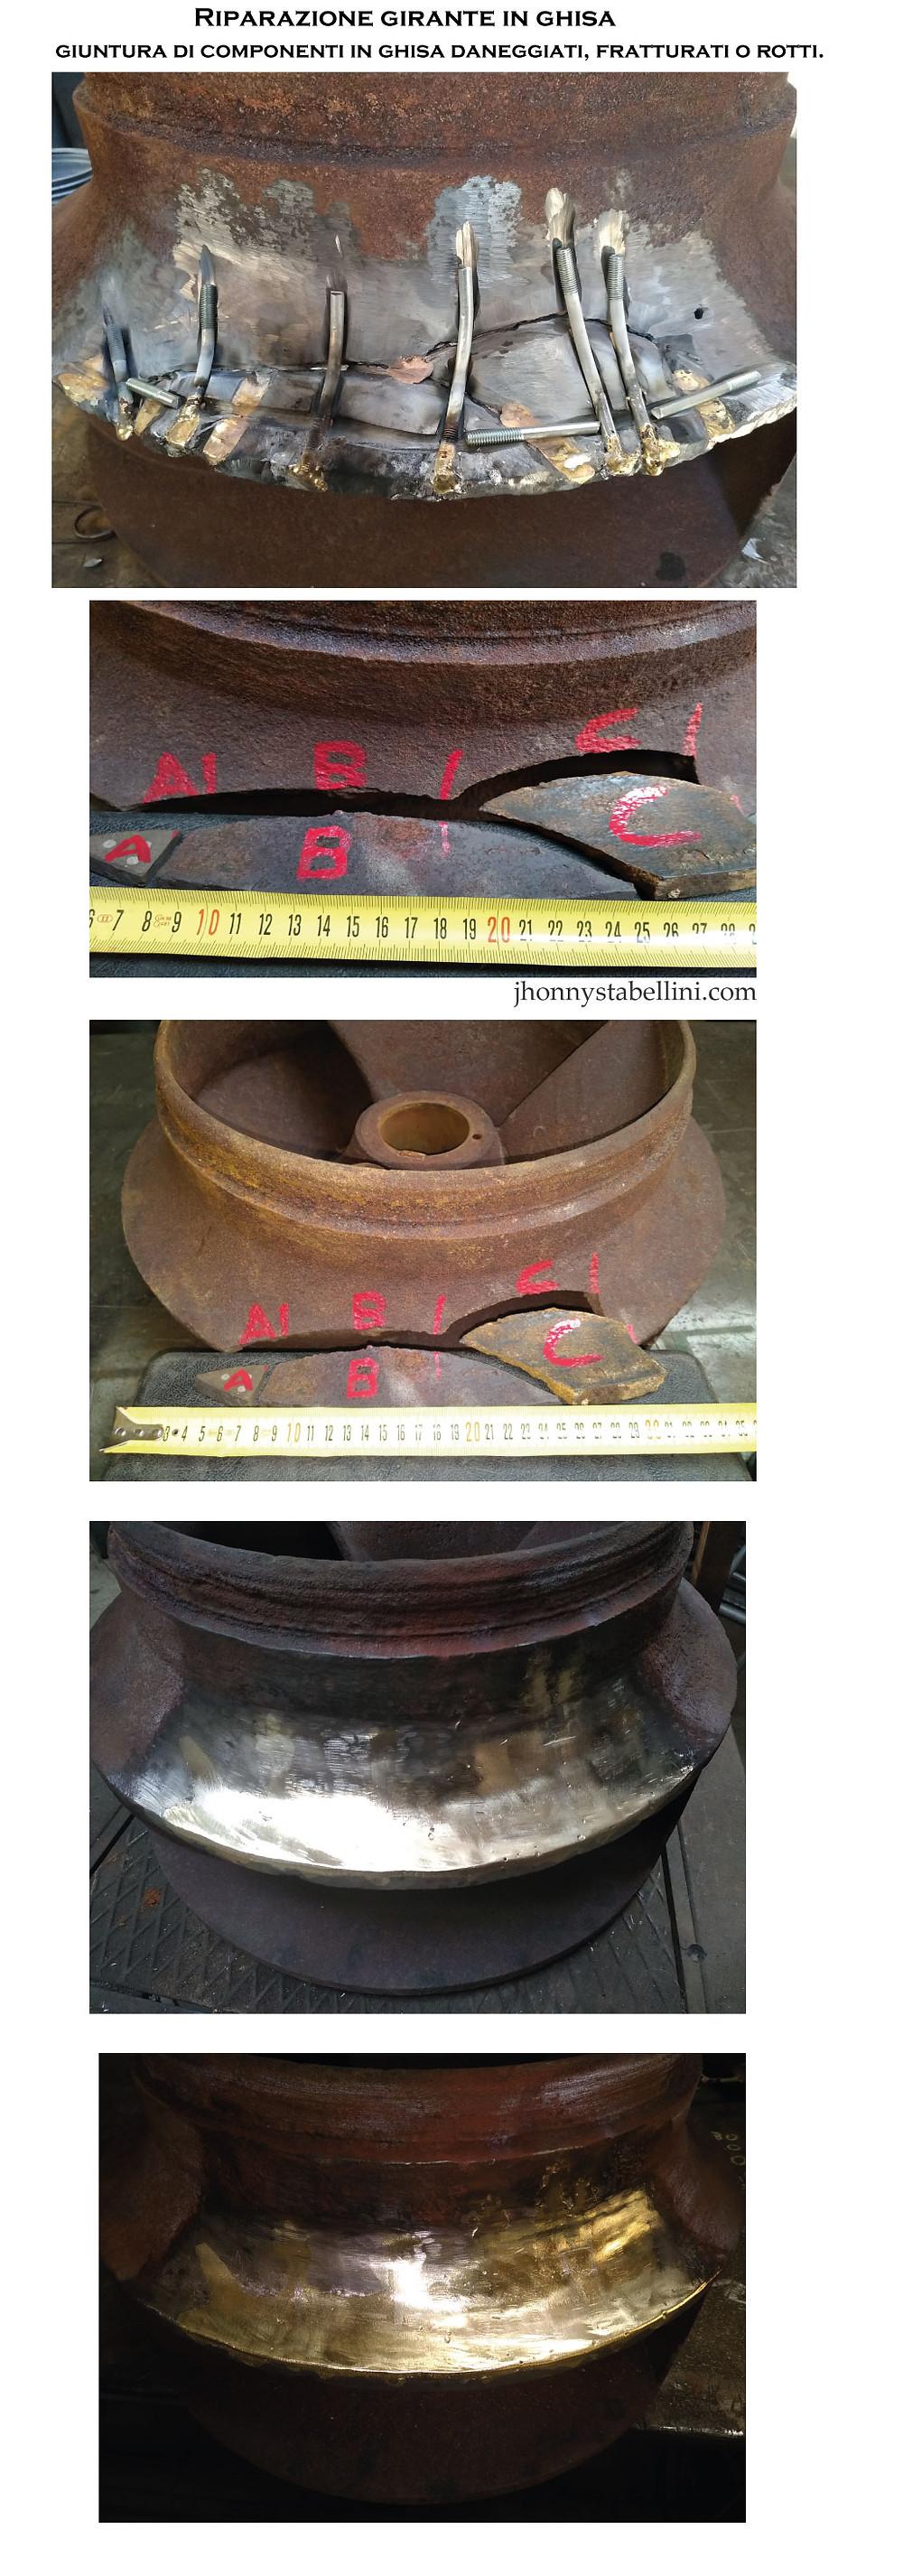 Riparazione girante in ghisa       giuntura di componenti in ghisa daneggiati, fratturati o rotti.